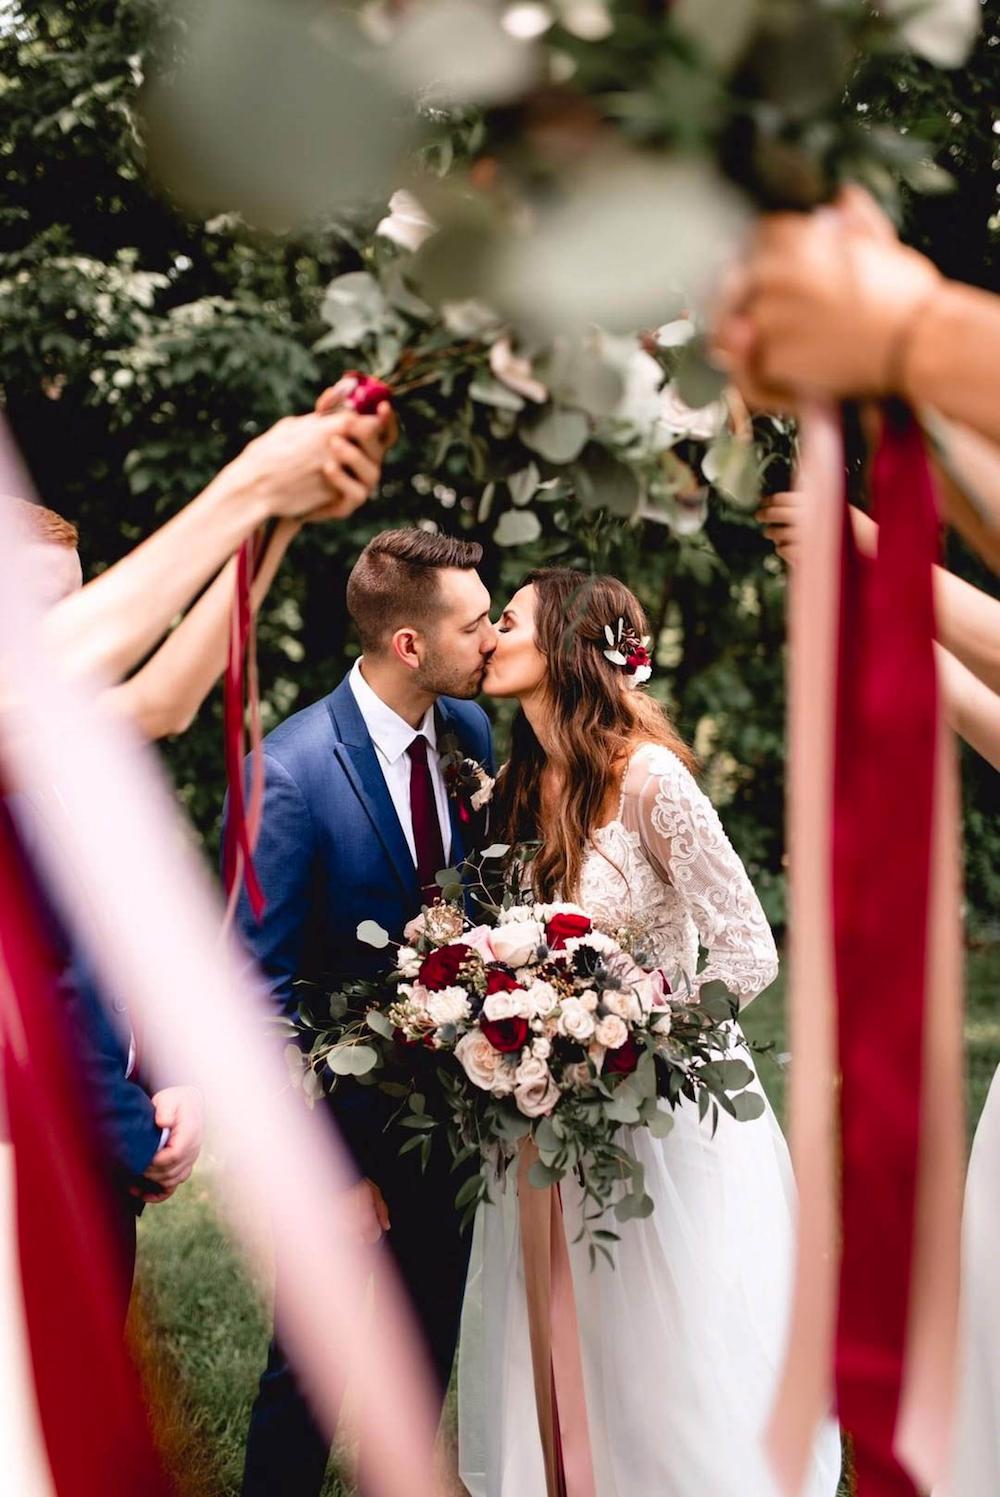 Valentine S Day Wedding Reception Ideas 13 Gorgeous Ideas For Your Wedding Loverly